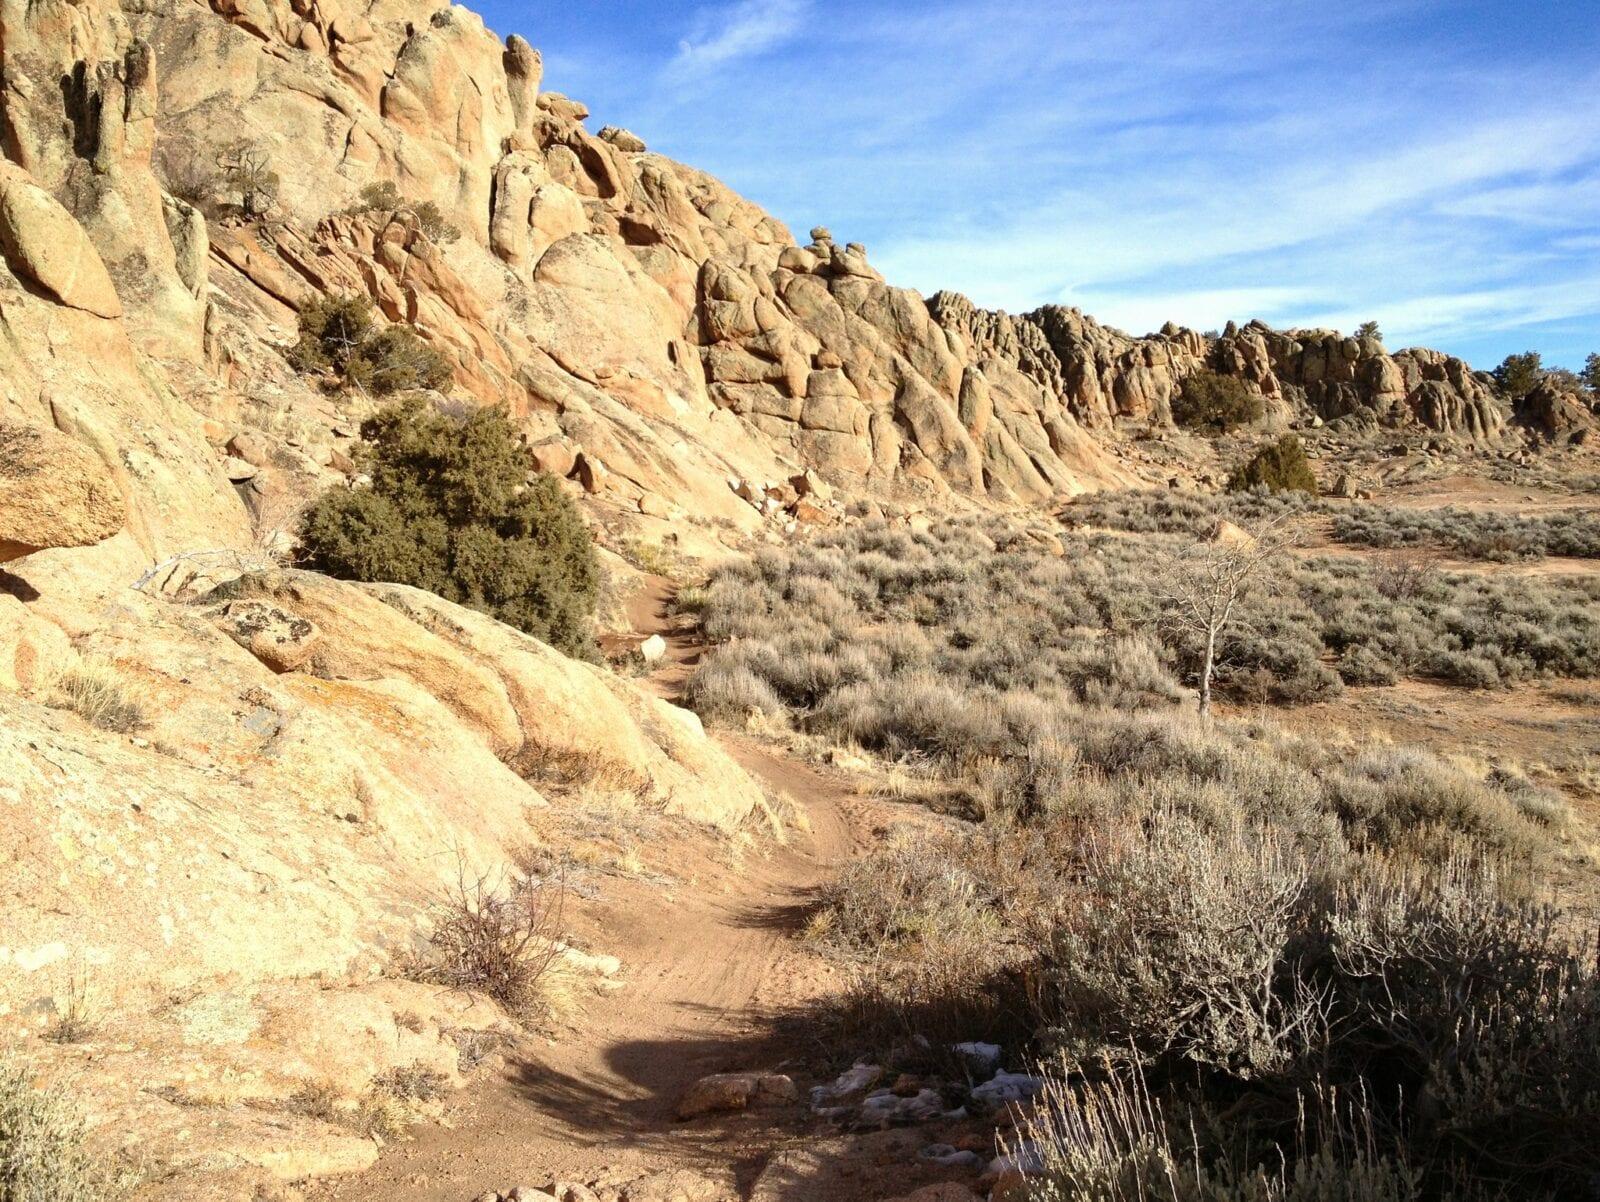 Image of the terrain in the Hartman Rock Recreation Area in Gunnison, Colorado